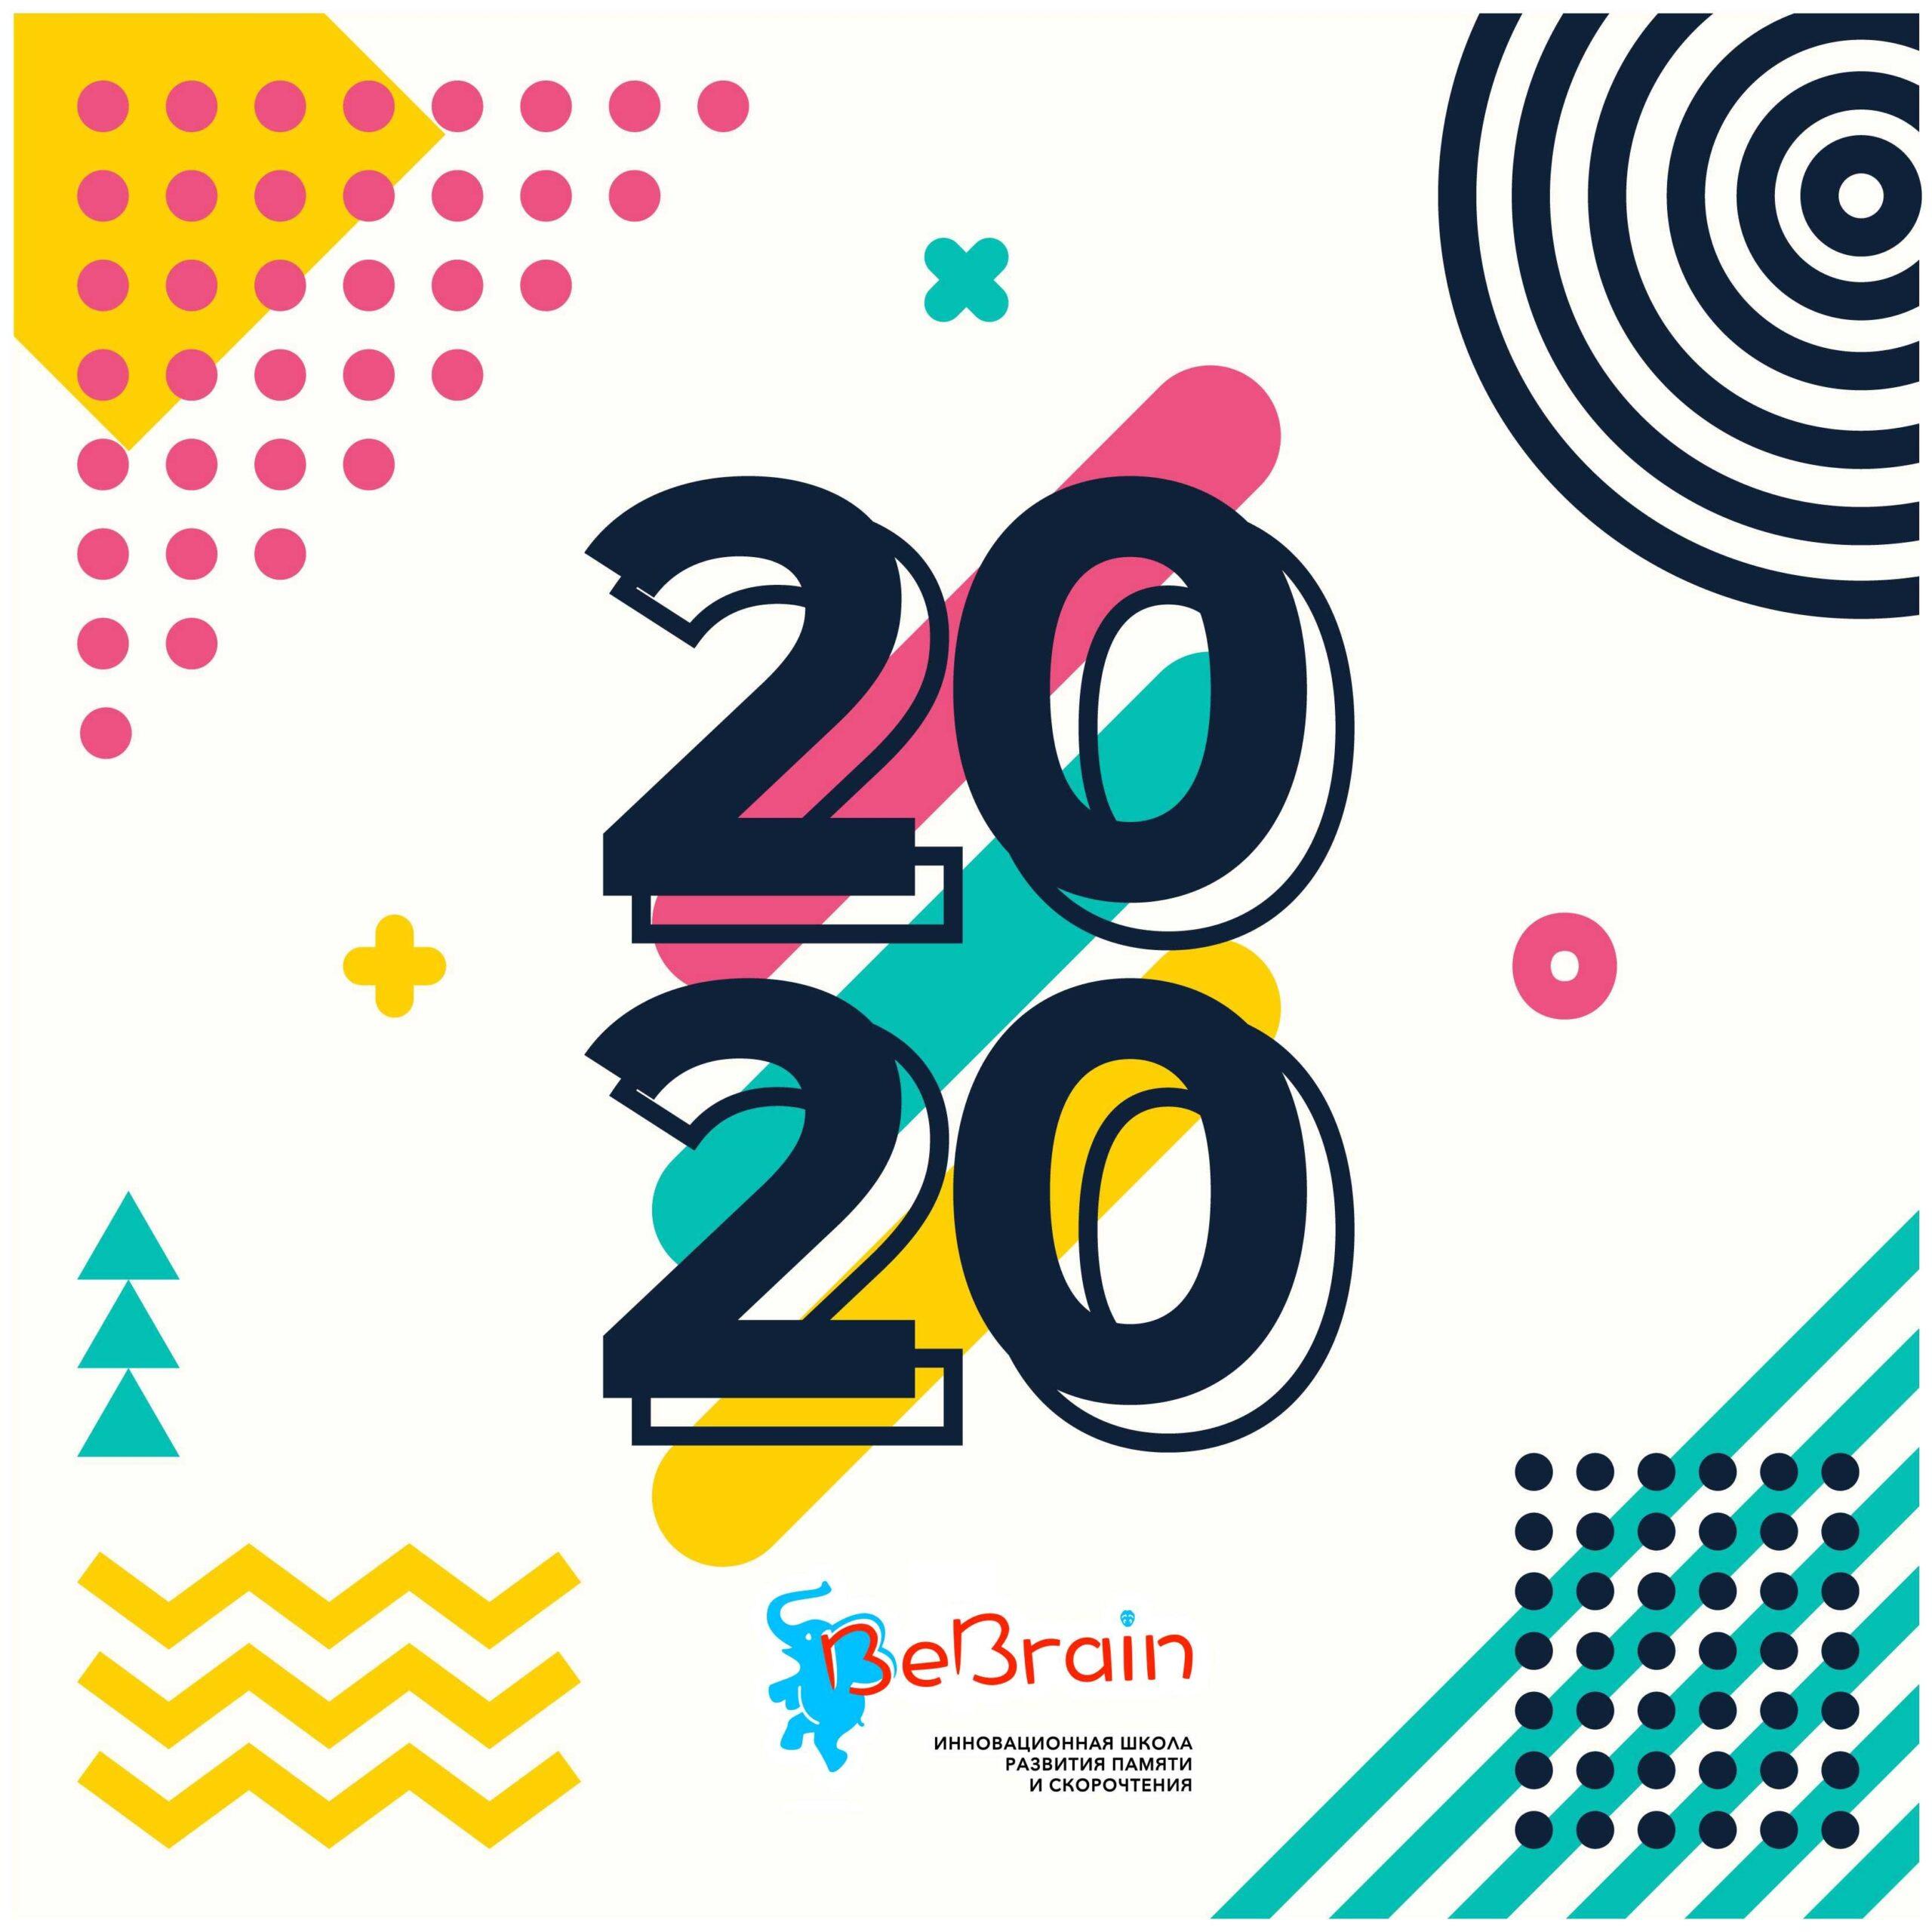 Открытка BeBrain 2020